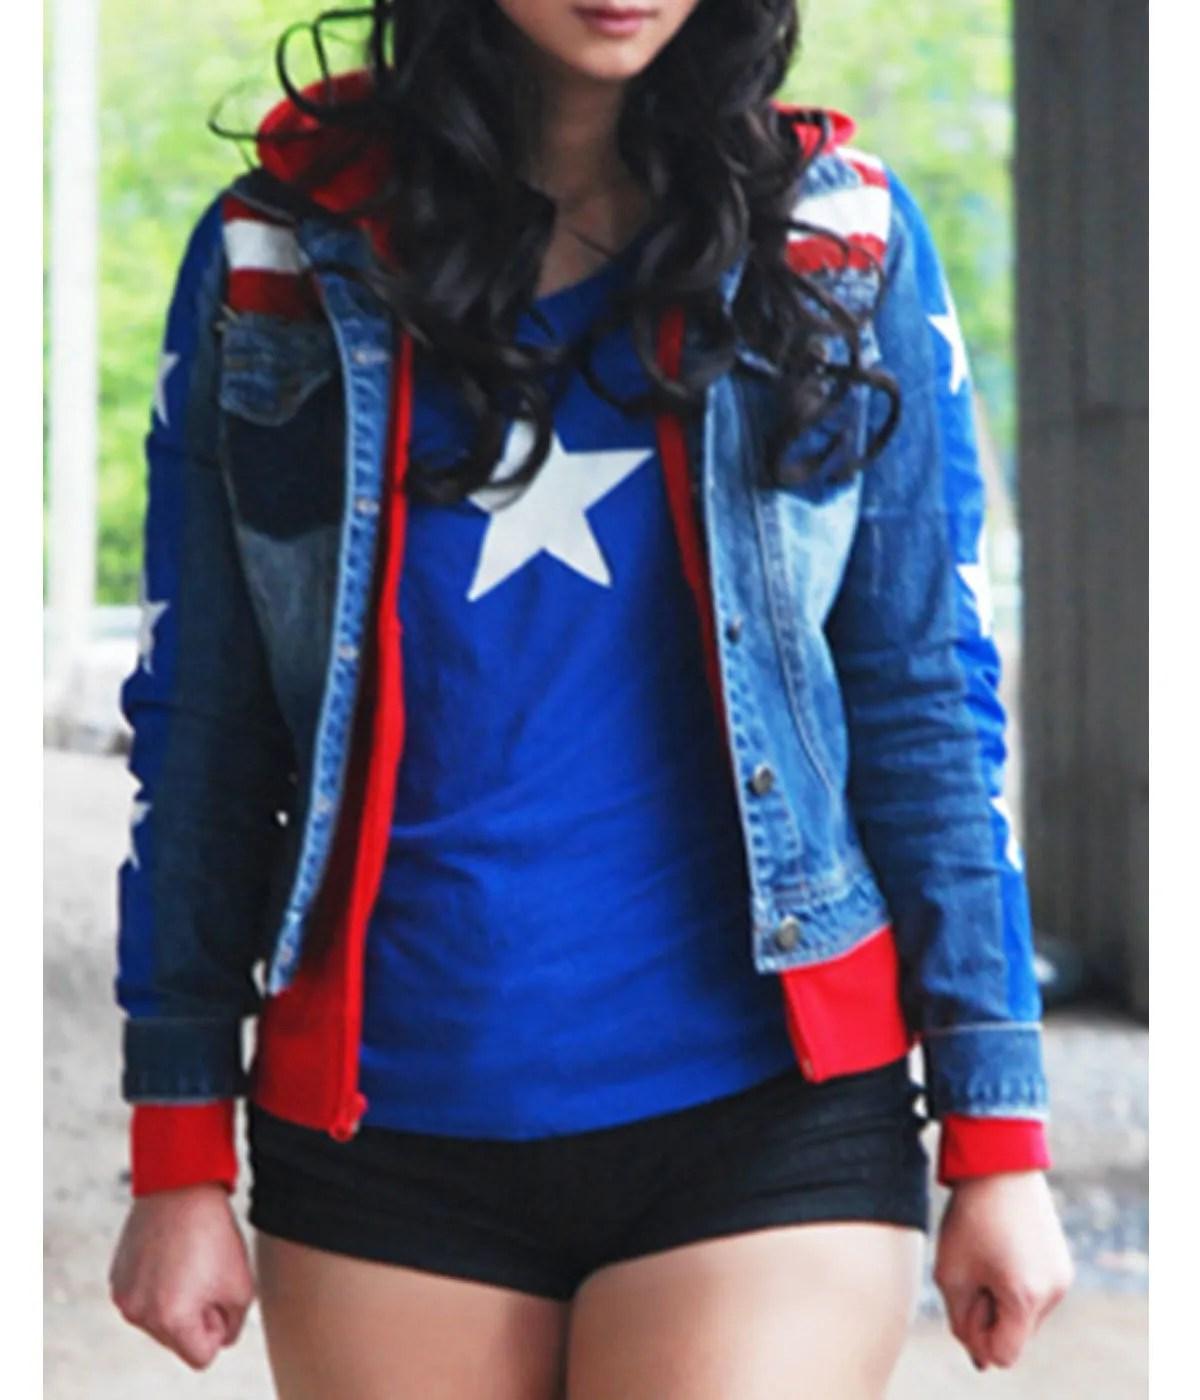 miss-america-blue-jacket